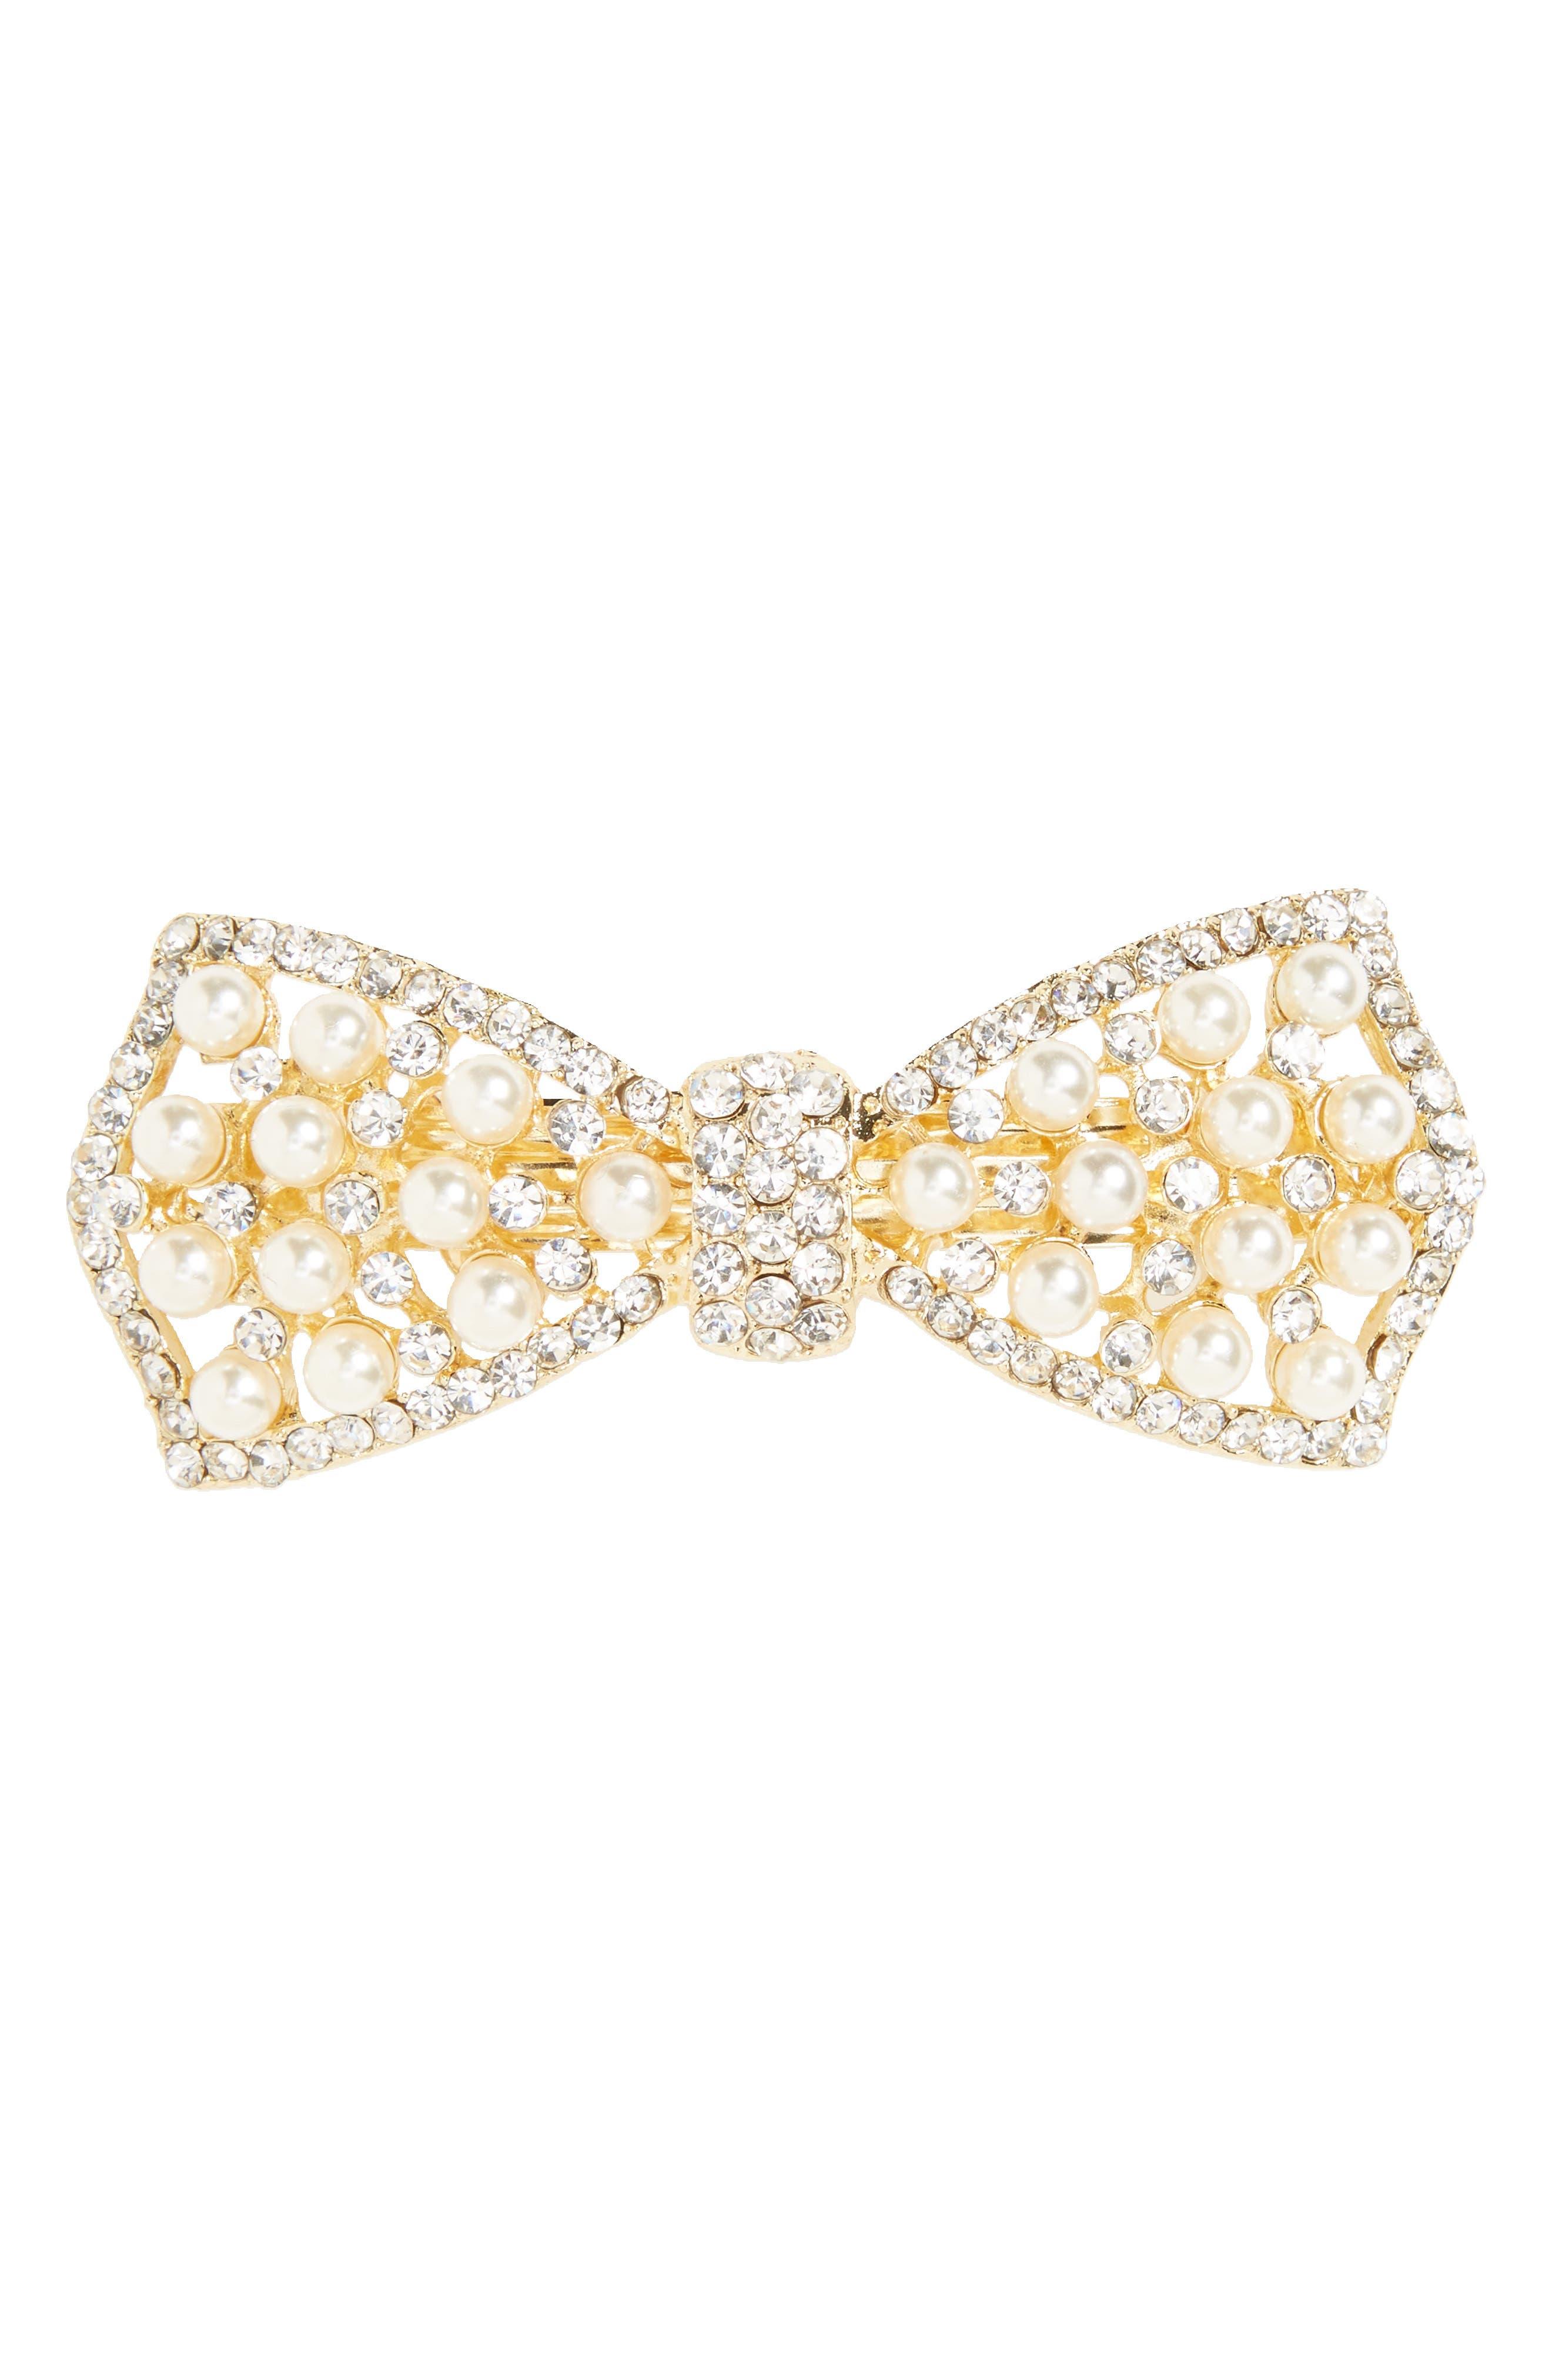 Imitation Pearl & Crystal Barrette,                         Main,                         color, Gold Multi